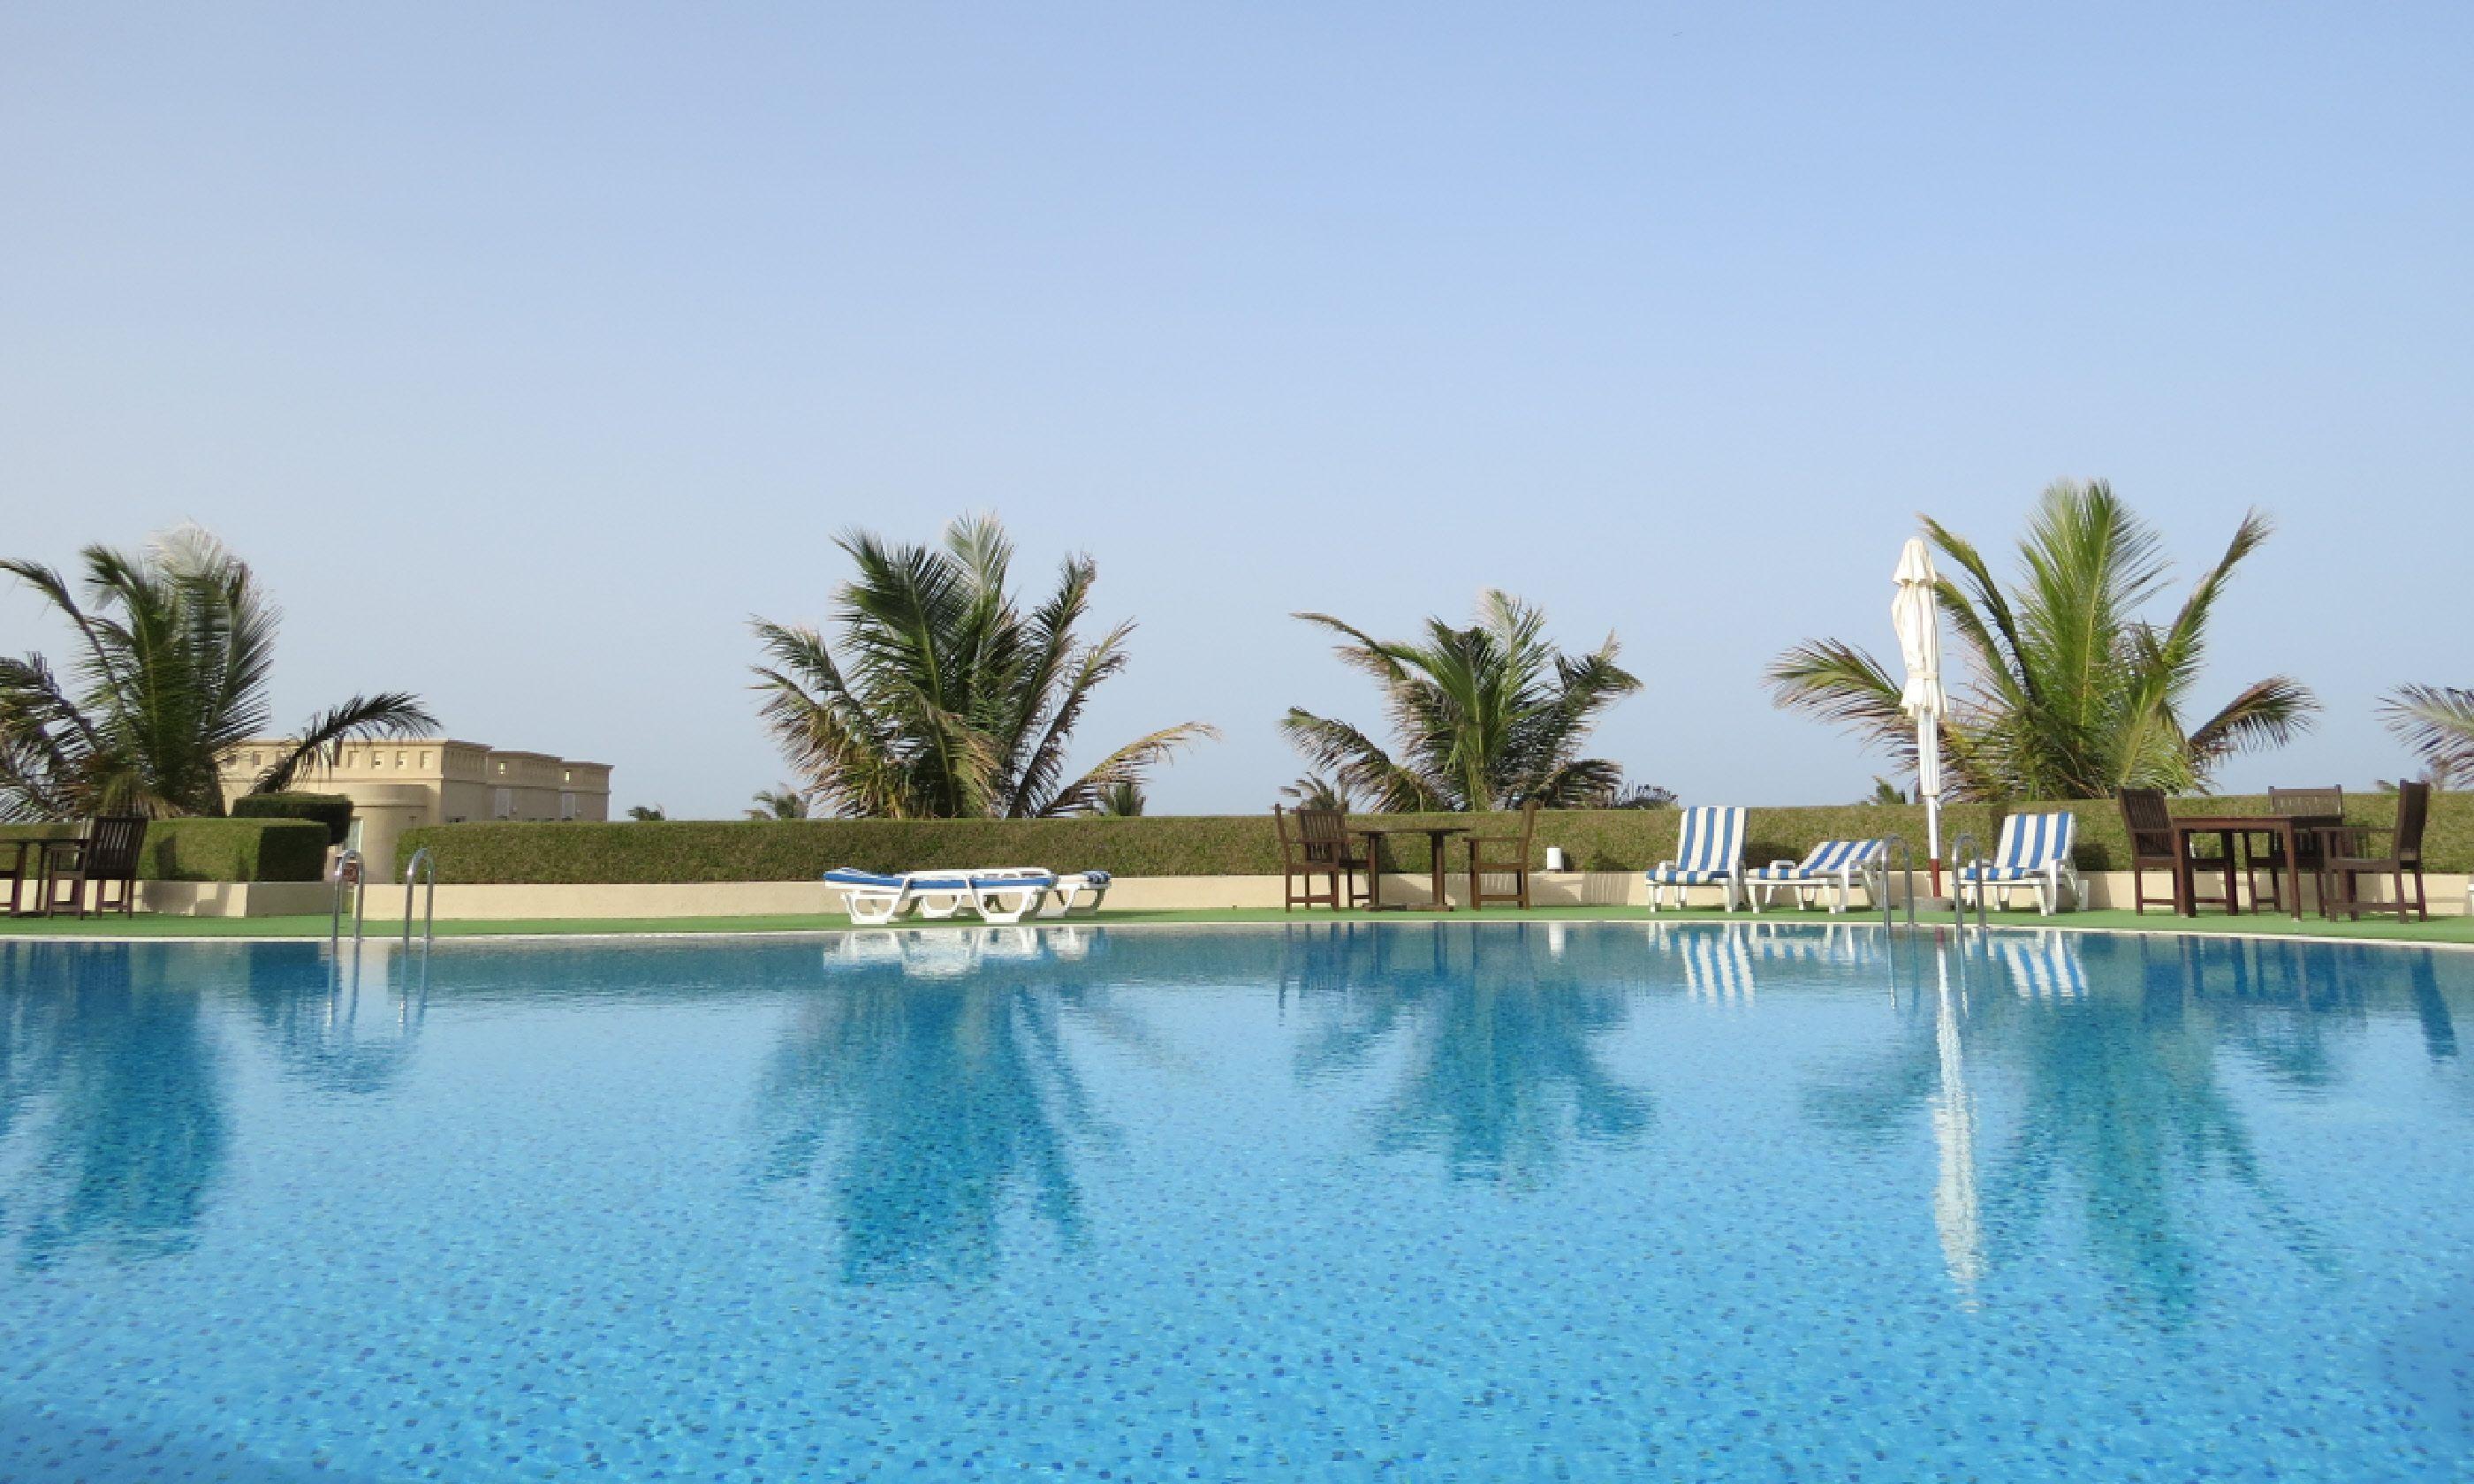 Masirah Island Resort (Hazel Plush)